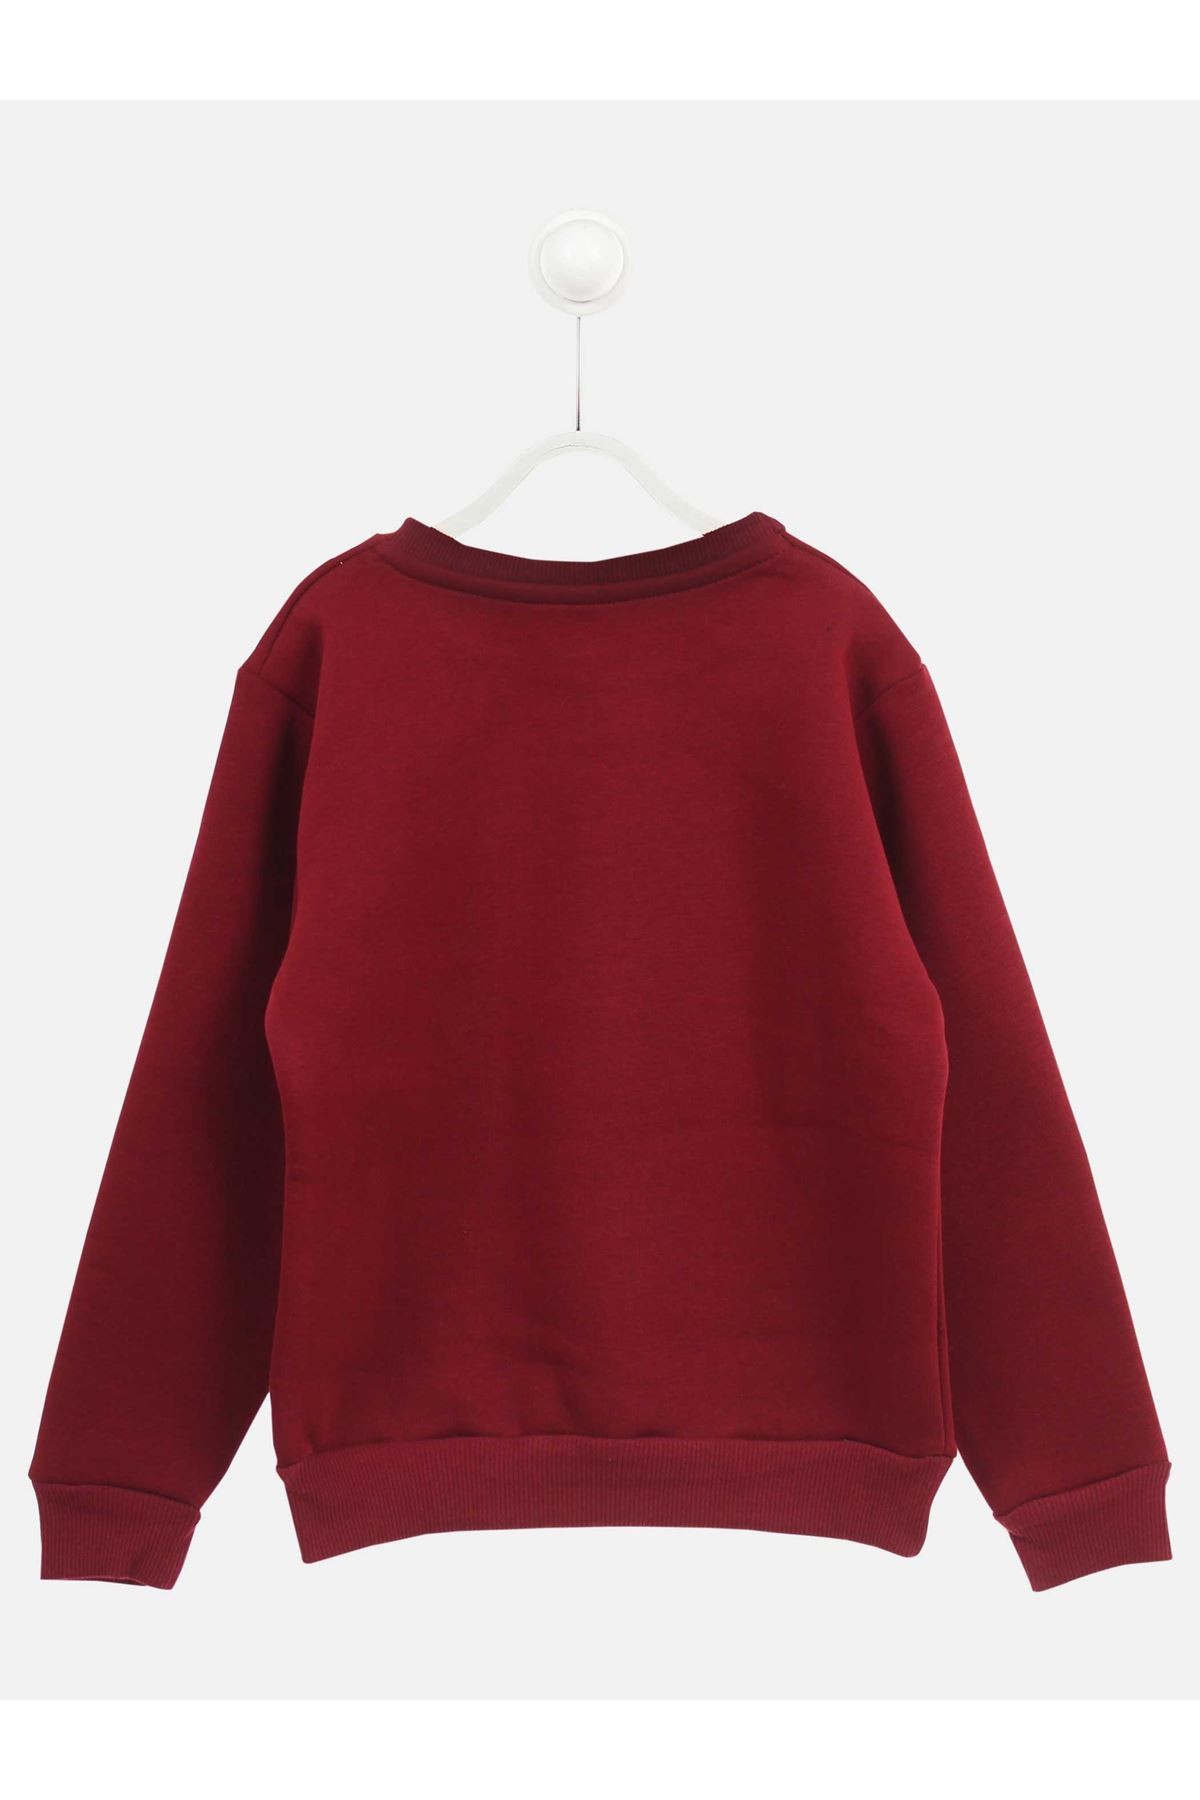 Burgundy Winter Male Child Sweatshirt